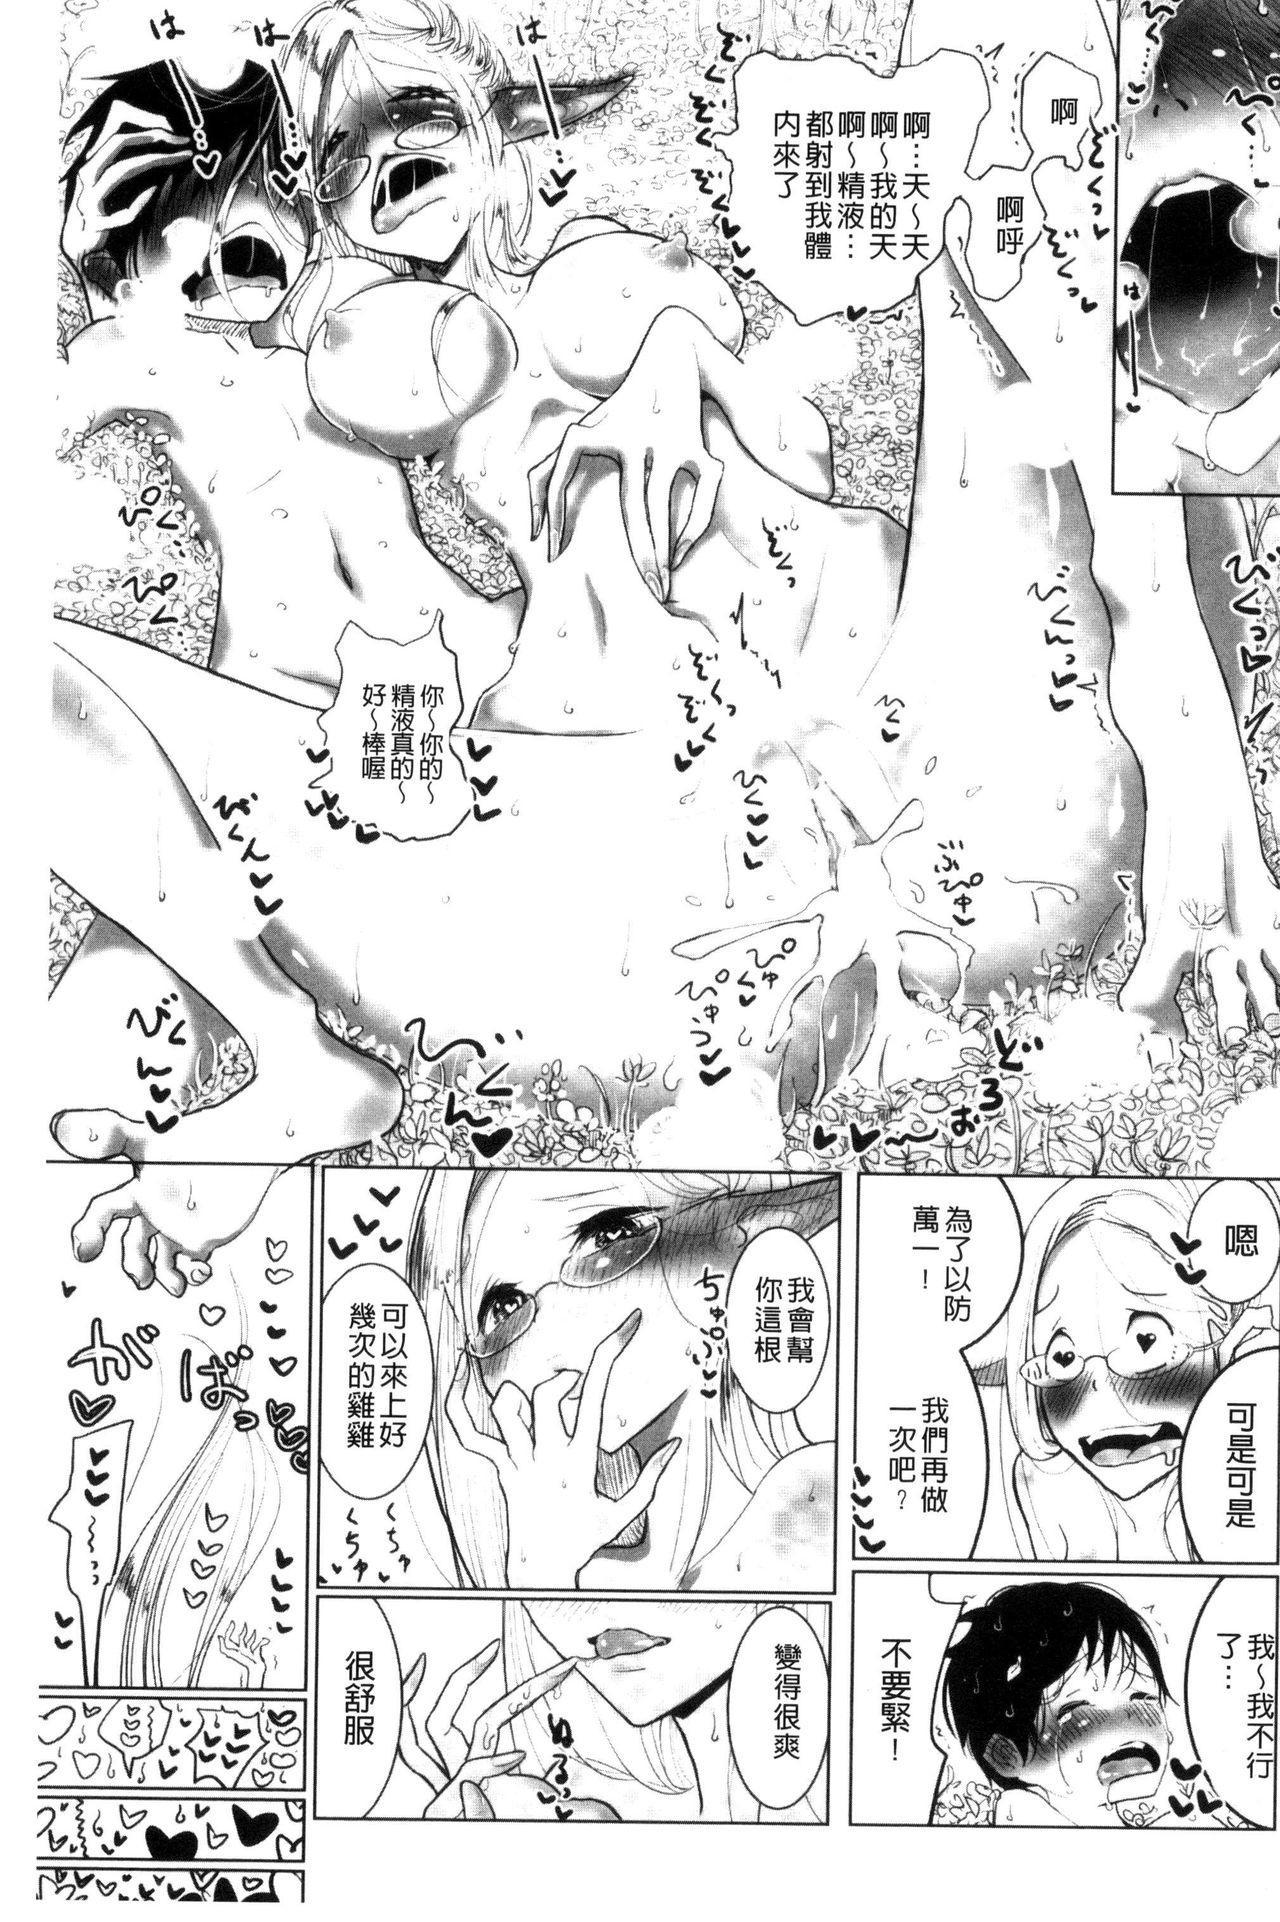 [Dhibi] Sono Yubisaki de Korogashite - Please Caress it at the Finger-tip. [Chinese] 132